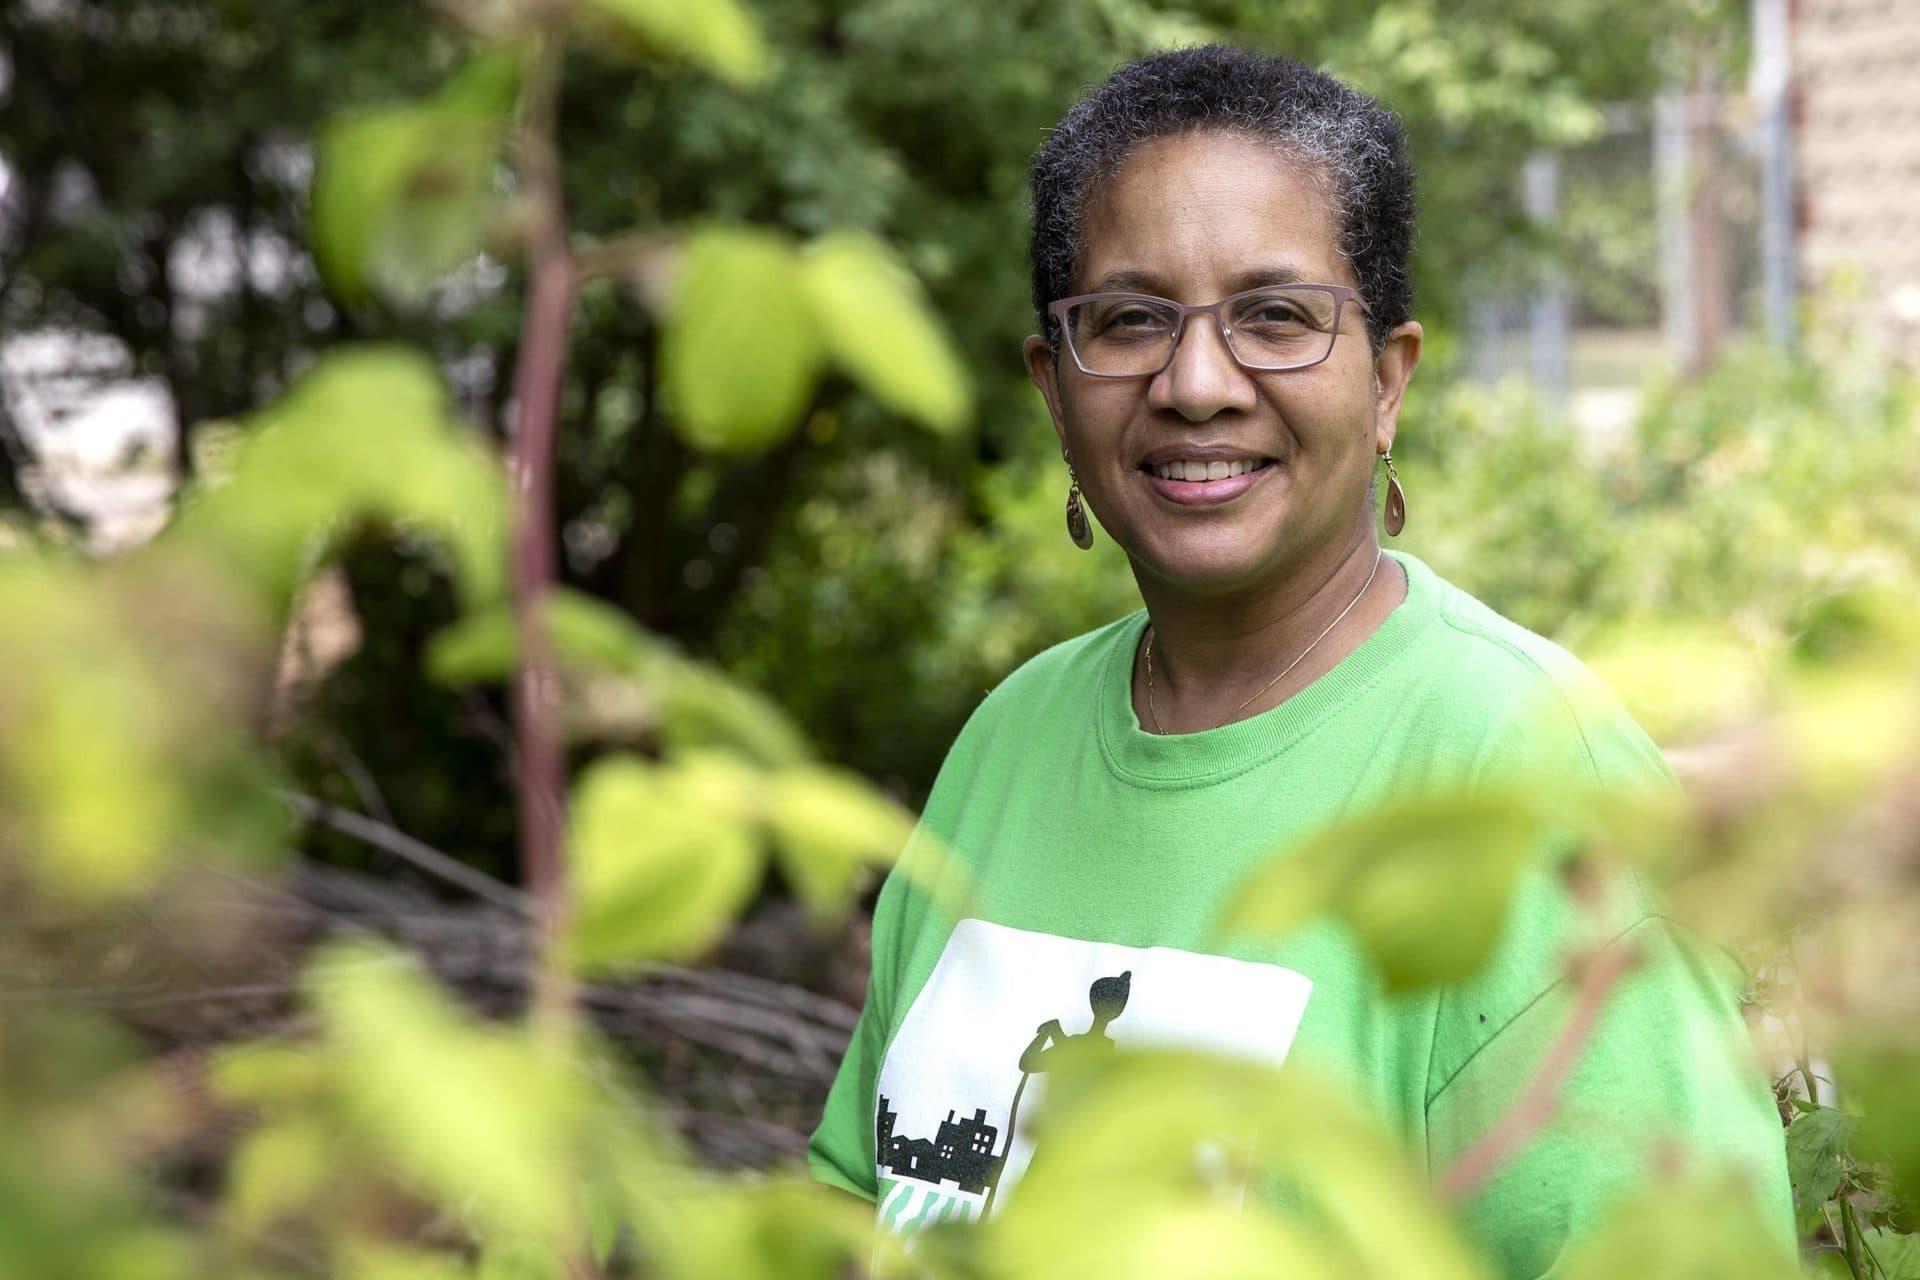 Patricia Spence, president of the Urban Farming Institute. (Robin Lubbock/WBUR)